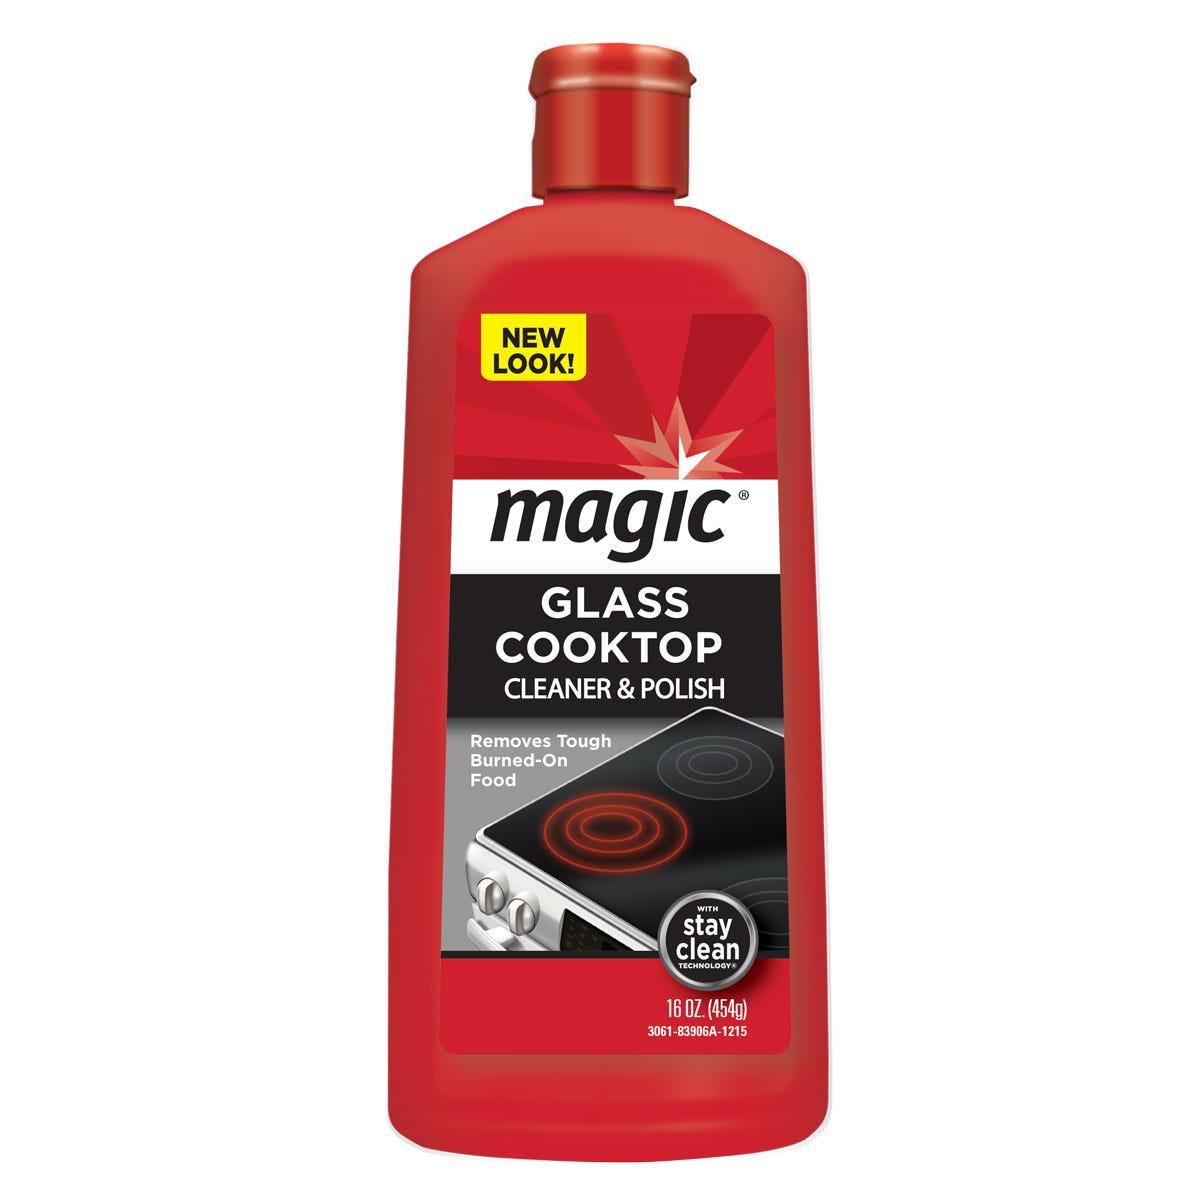 https://googone.com/media/catalog/product/m/a/magic-cooktop-cleaner-polish_front.jpg